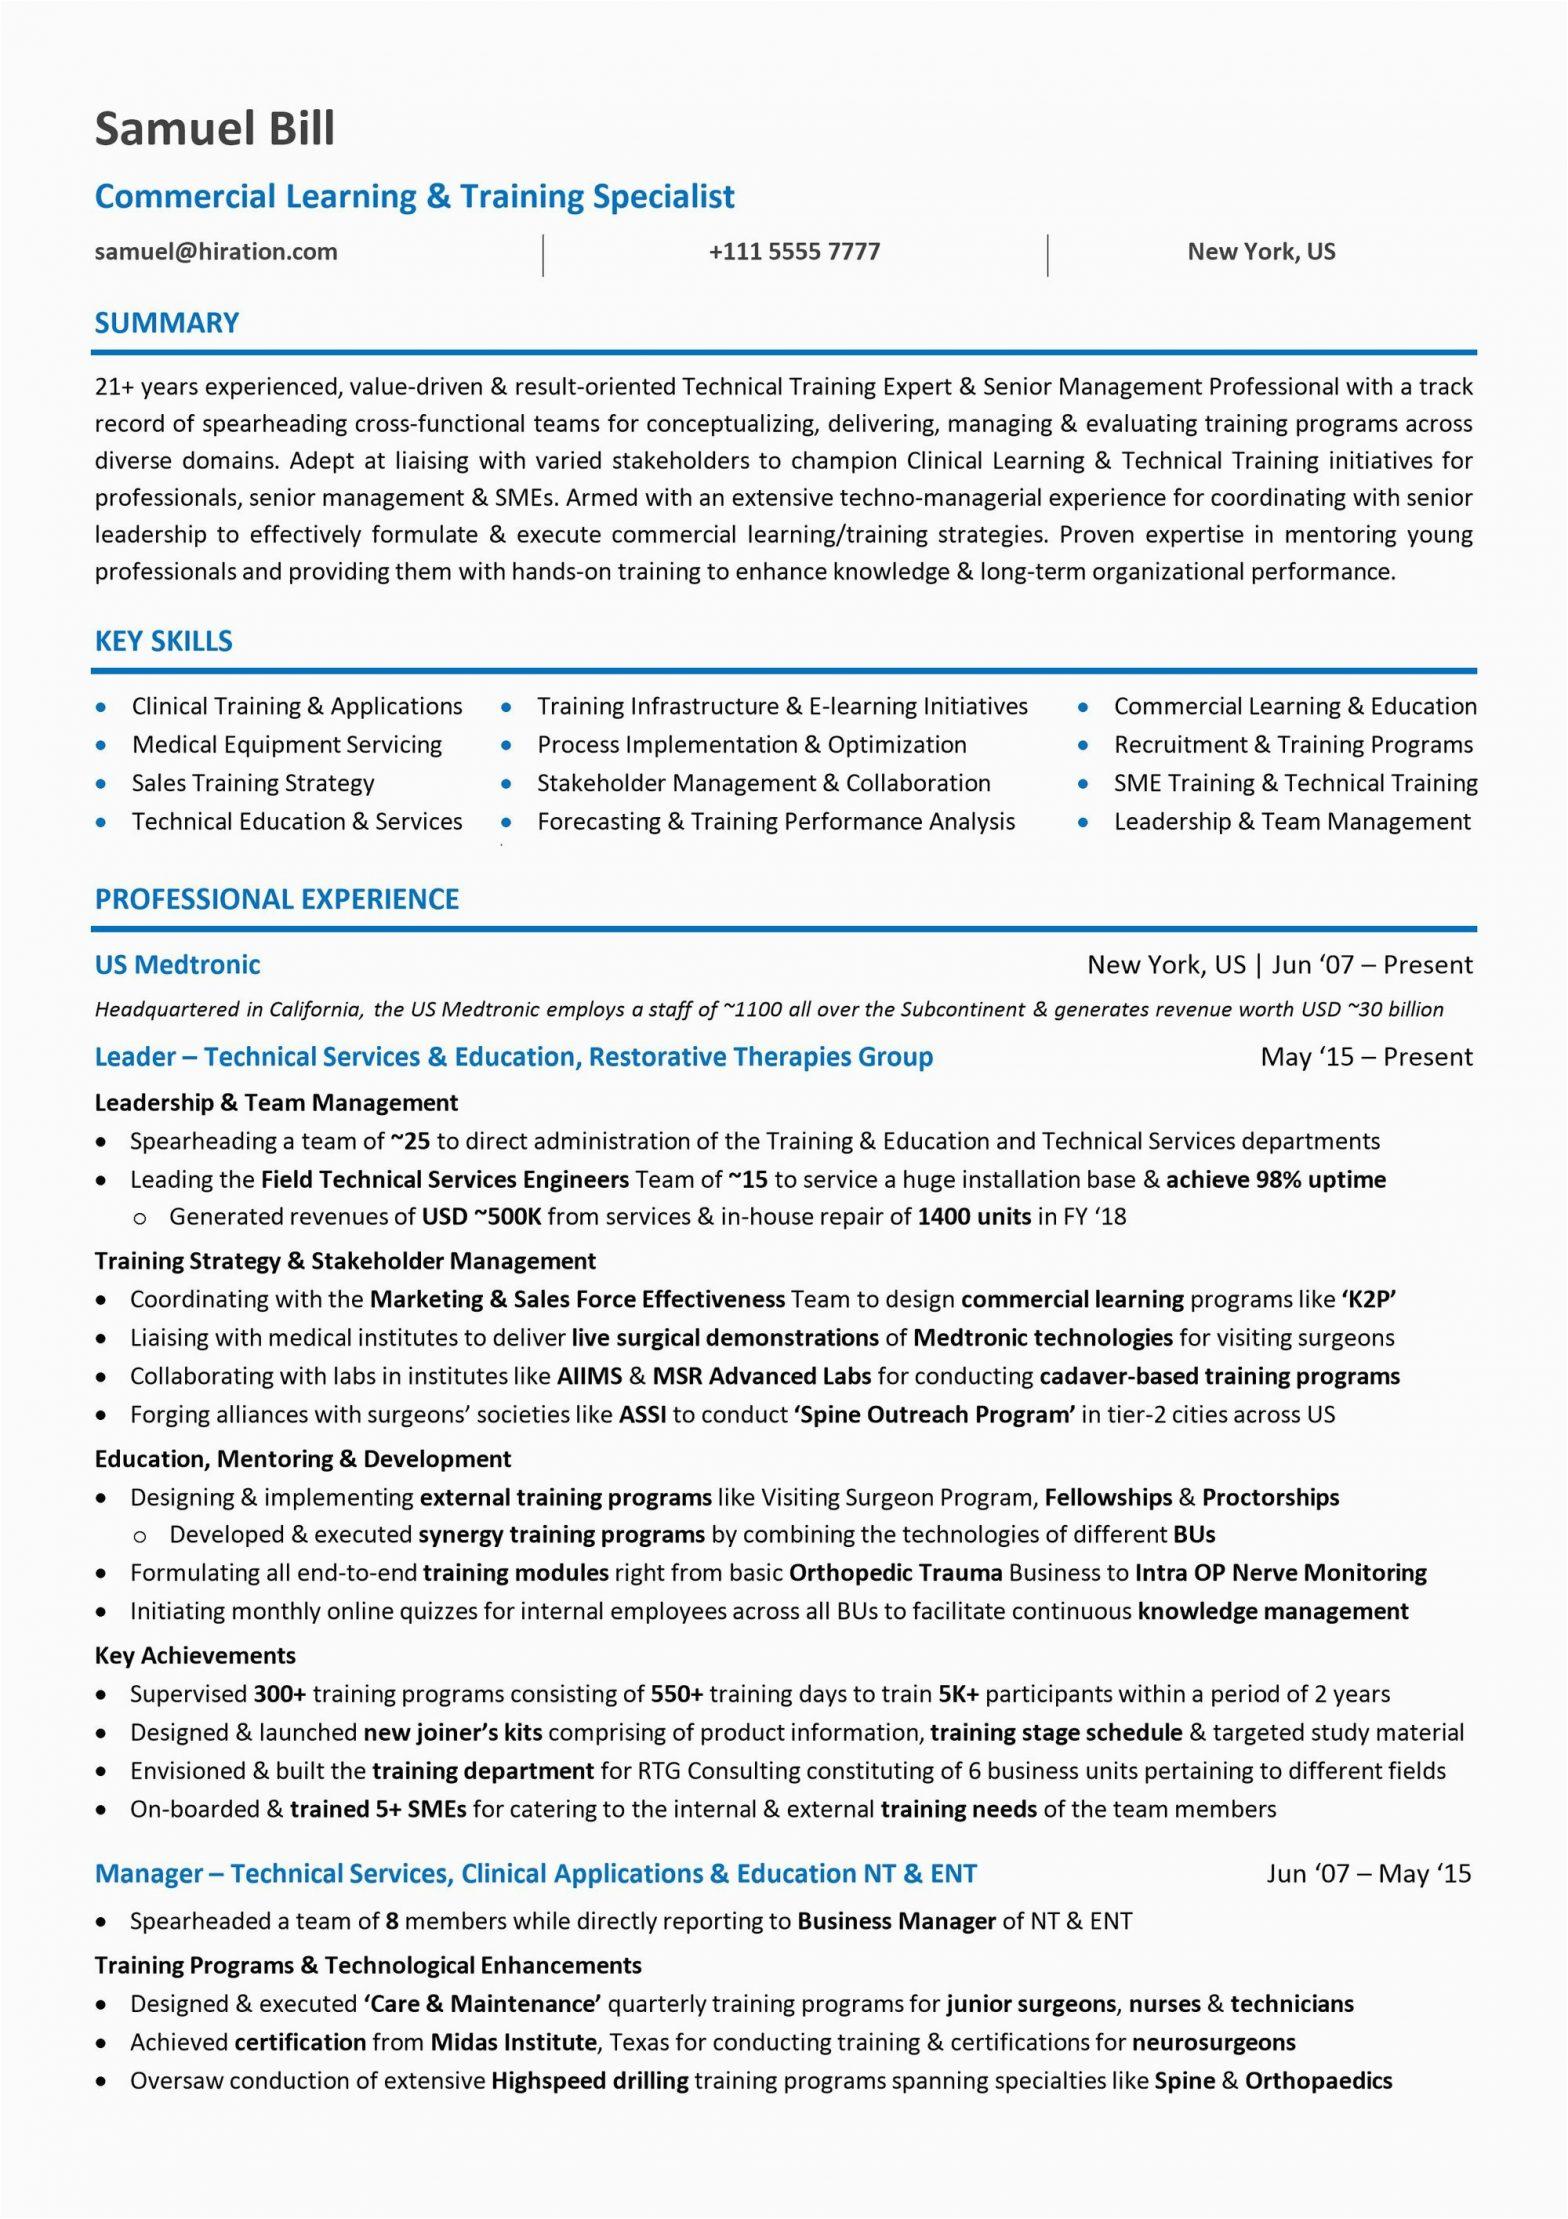 Sample Resume Summary for Career Change General Resume Objective Examples for Career Change Best